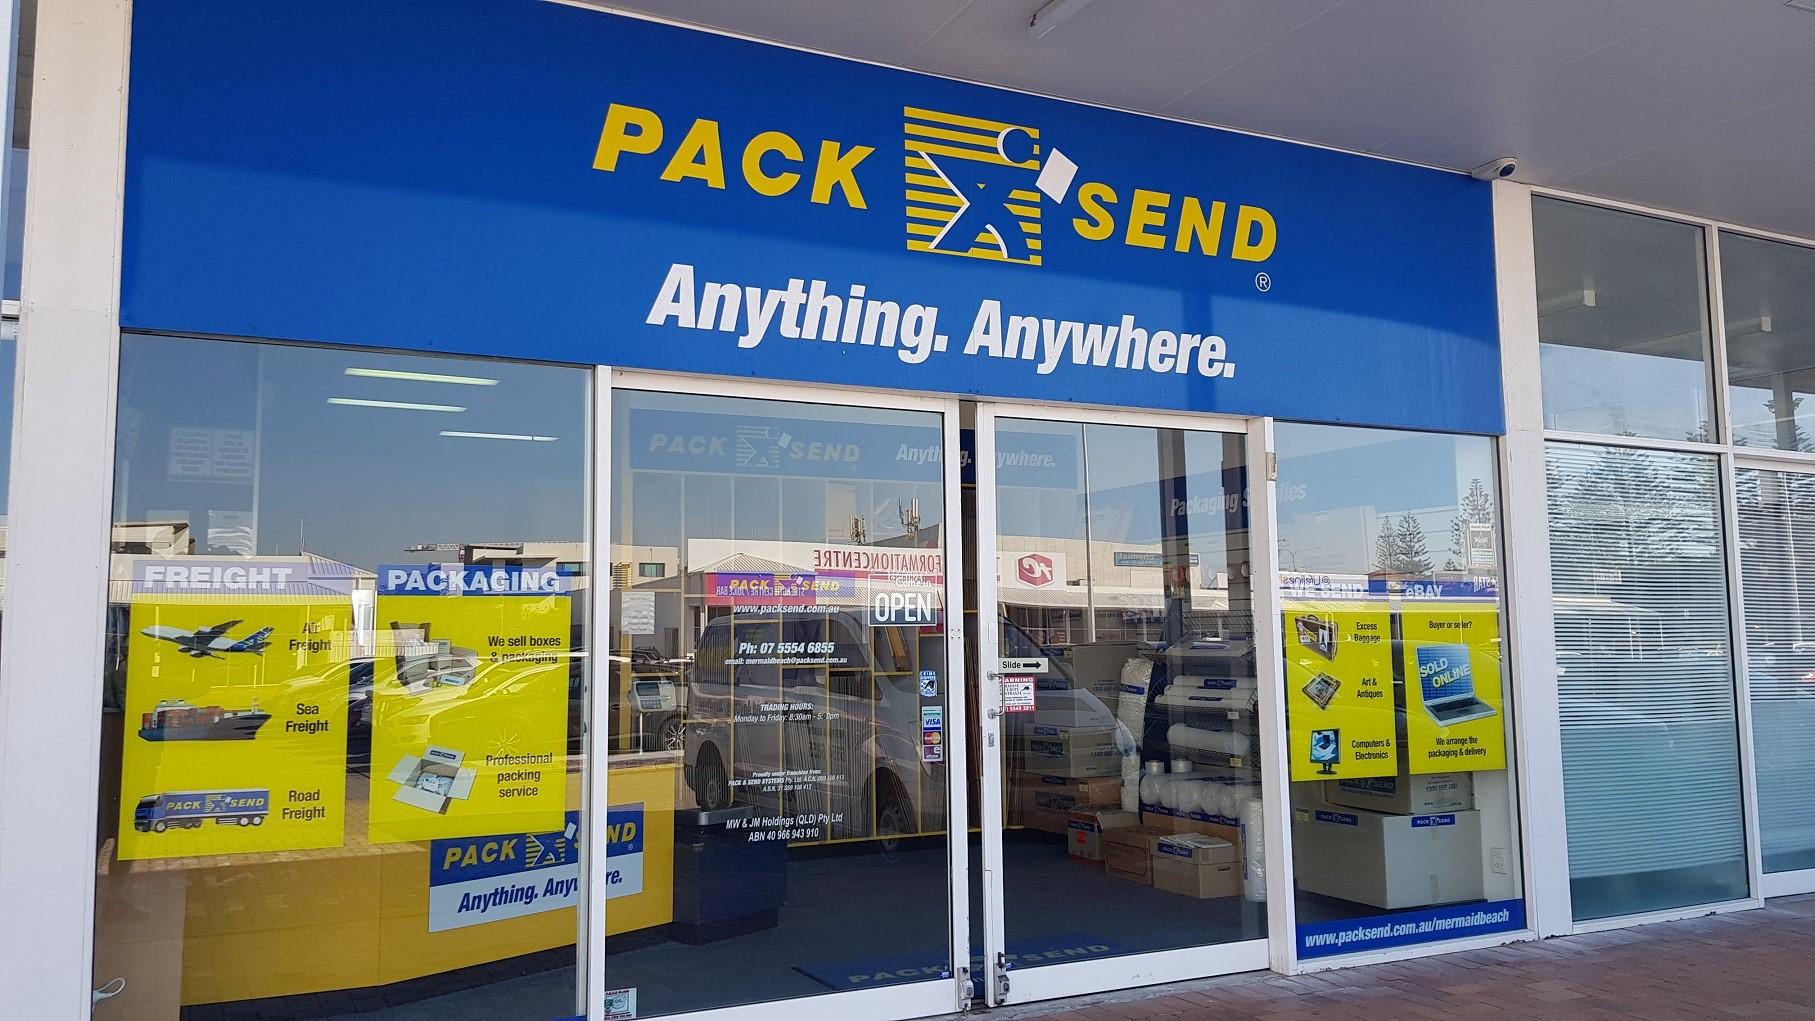 Courier, Freight, Shipping - PACK & SEND Mermaid Beach, QLD